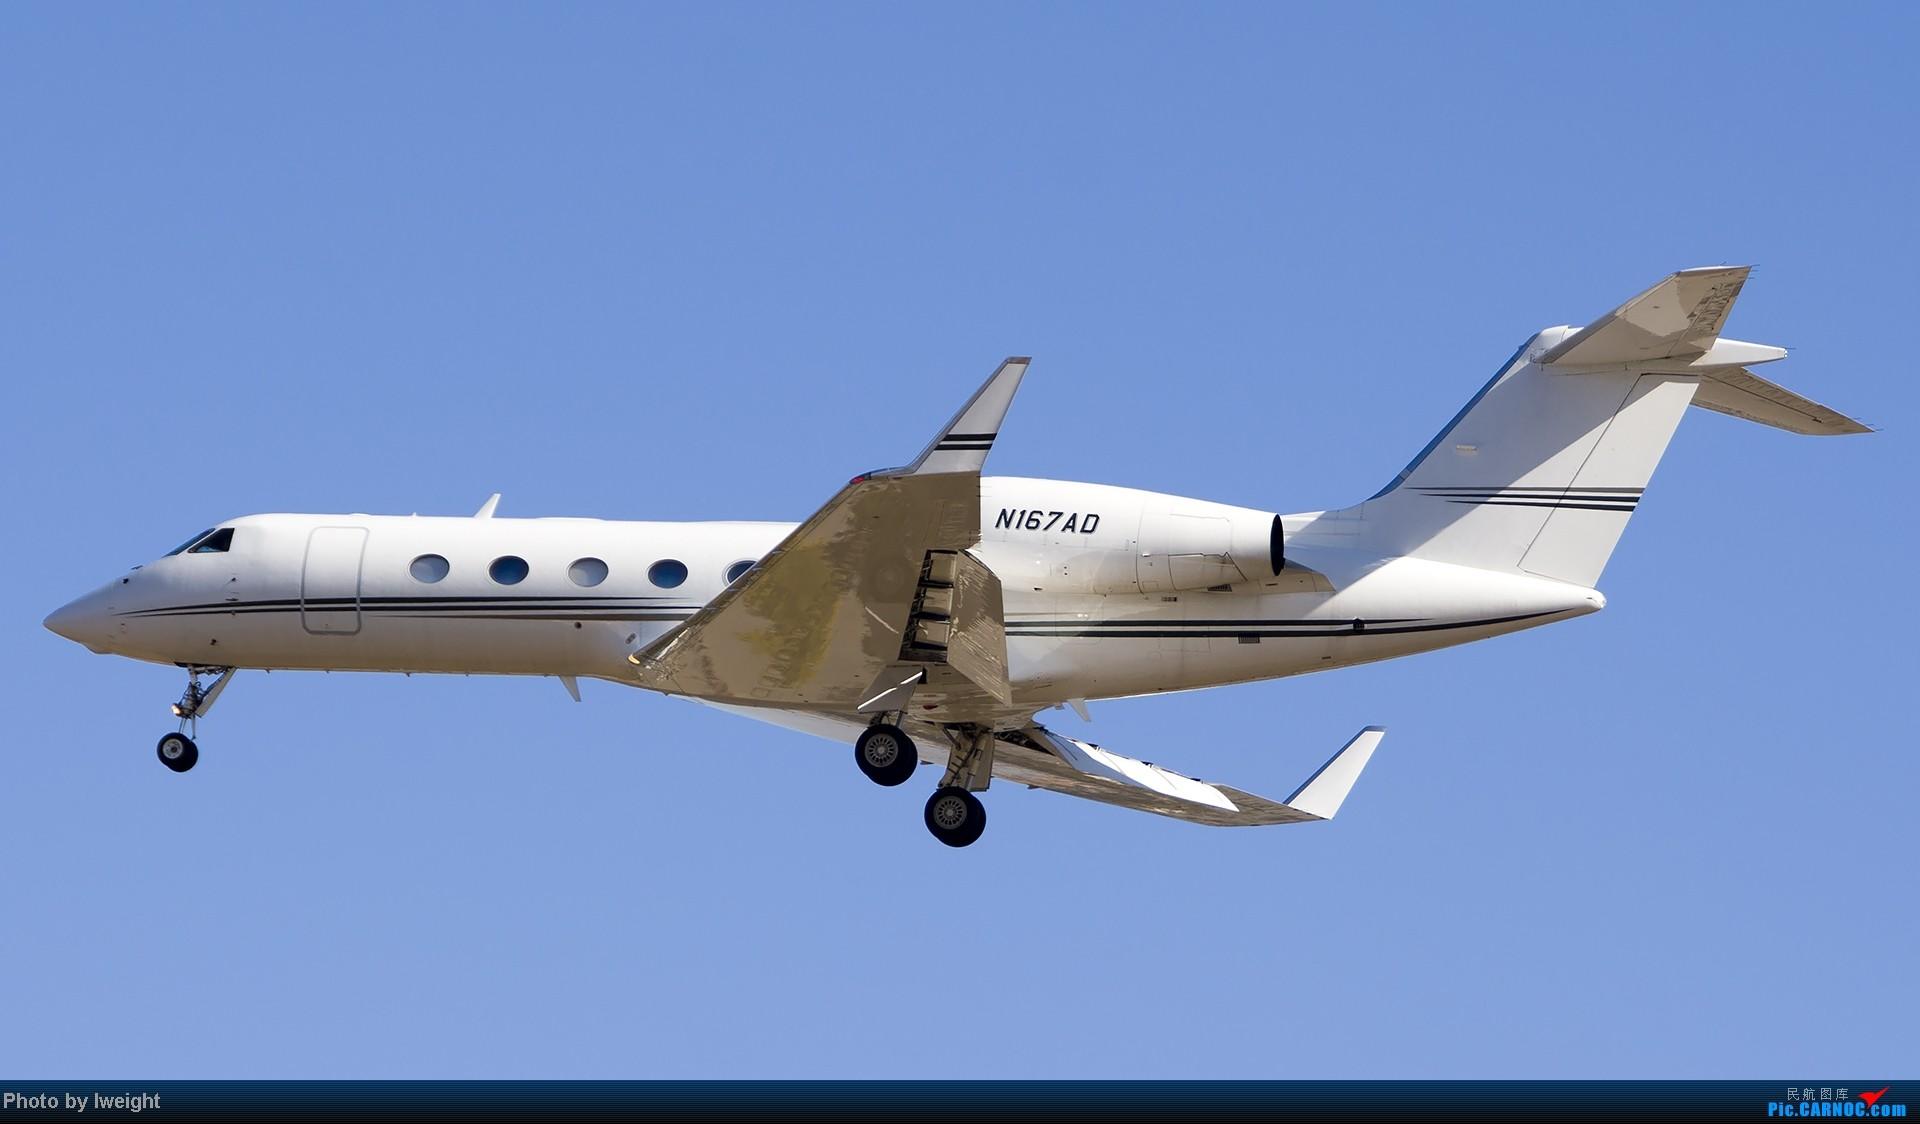 Re:[原创]抓住APEC蓝的尾巴,再拍上一组 GULFSTREAM G450 N167AD 中国北京首都机场